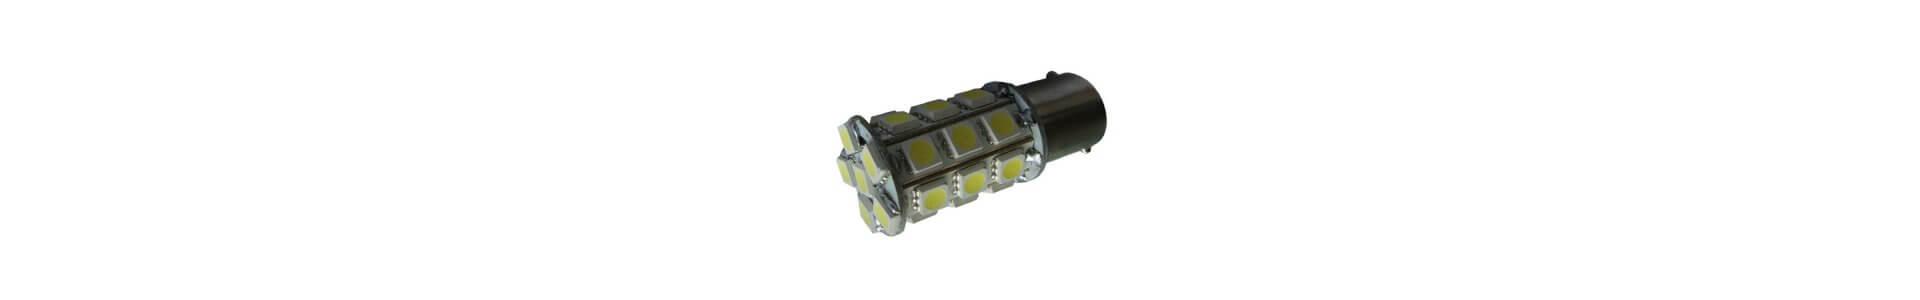 Led lampor bil & 12V fordonsbelysning